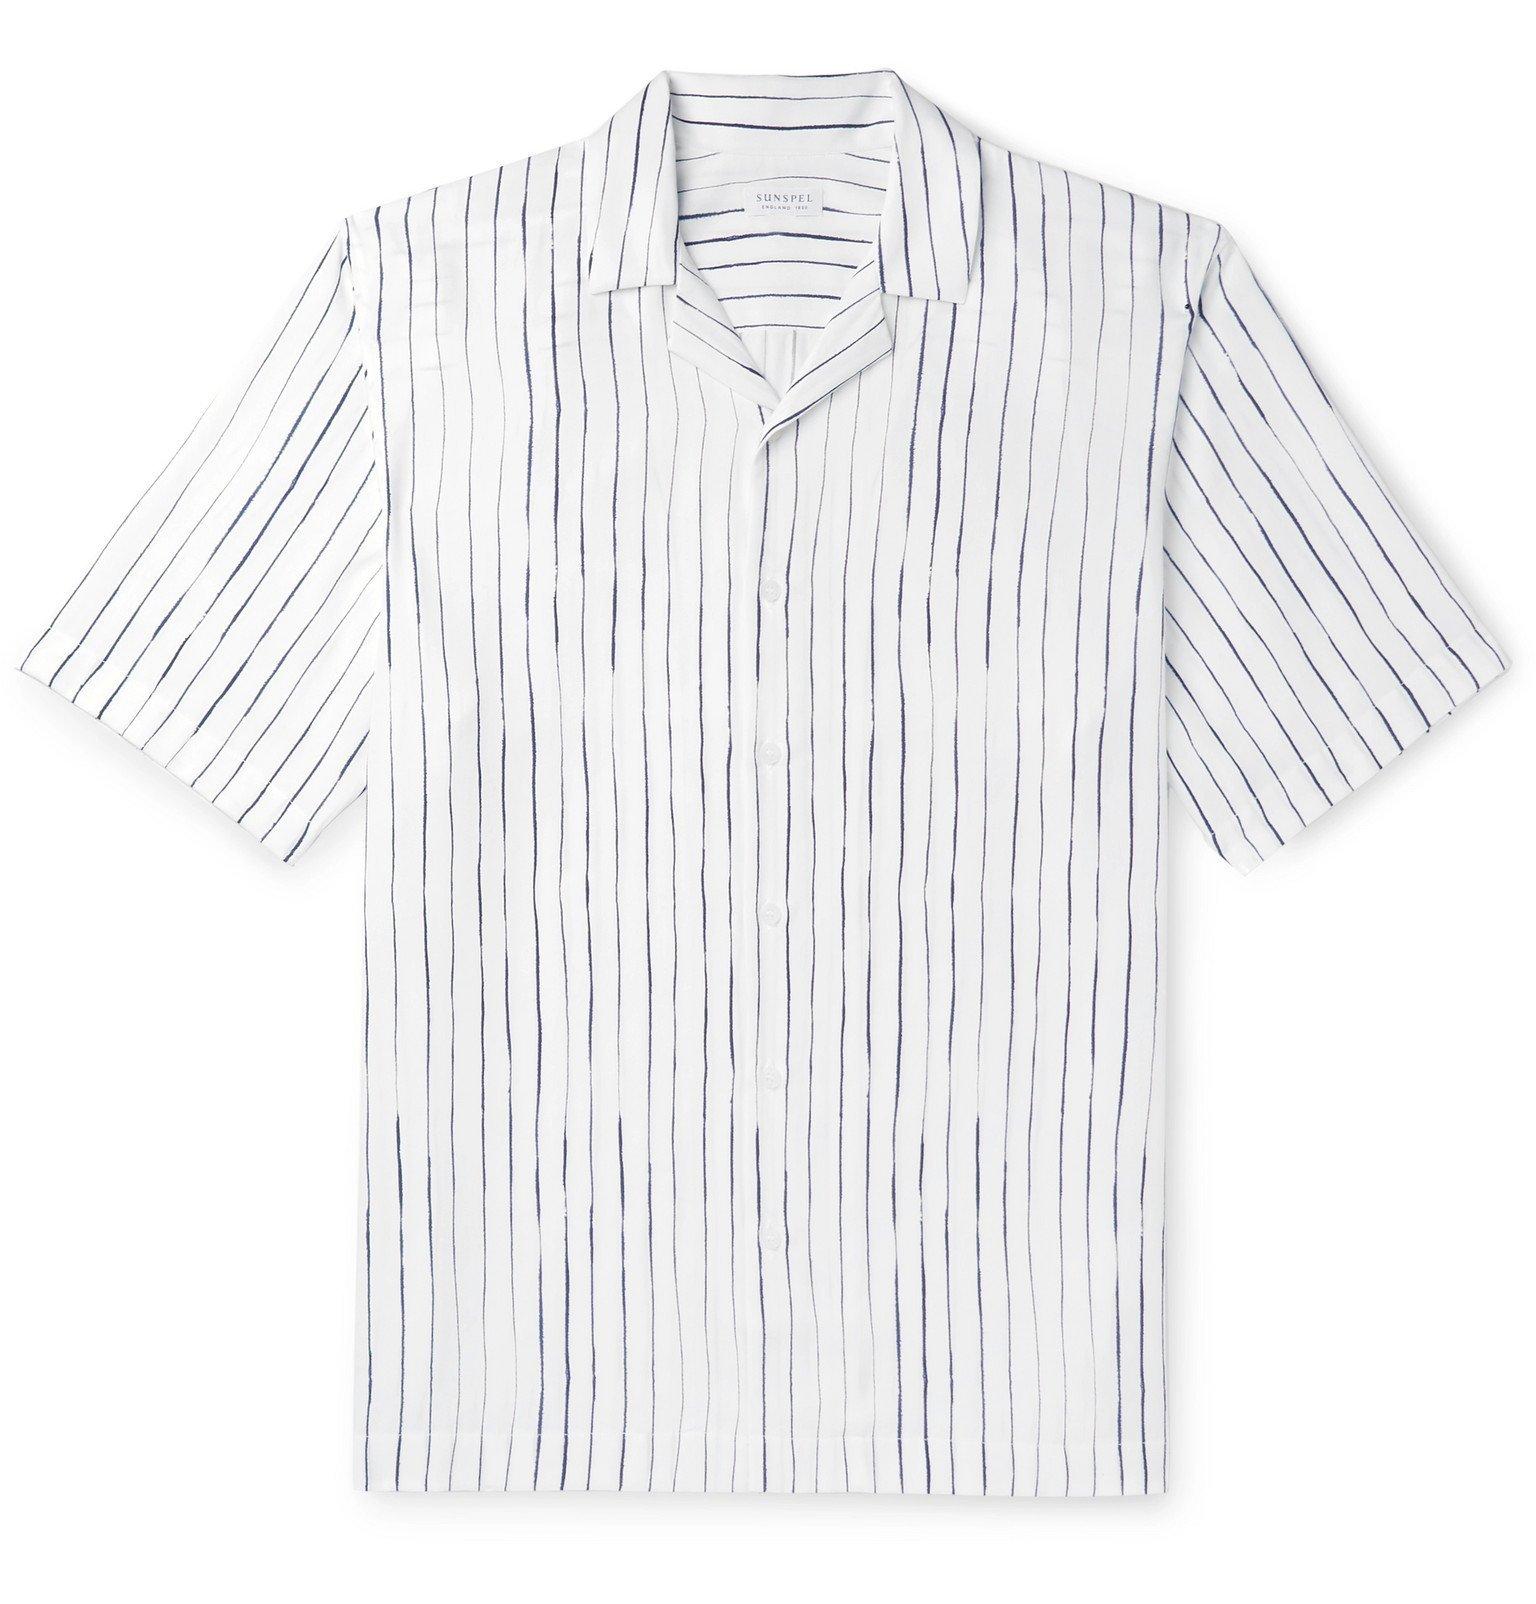 Sunspel - Camp-Collar Striped Lyocell Shirt - White